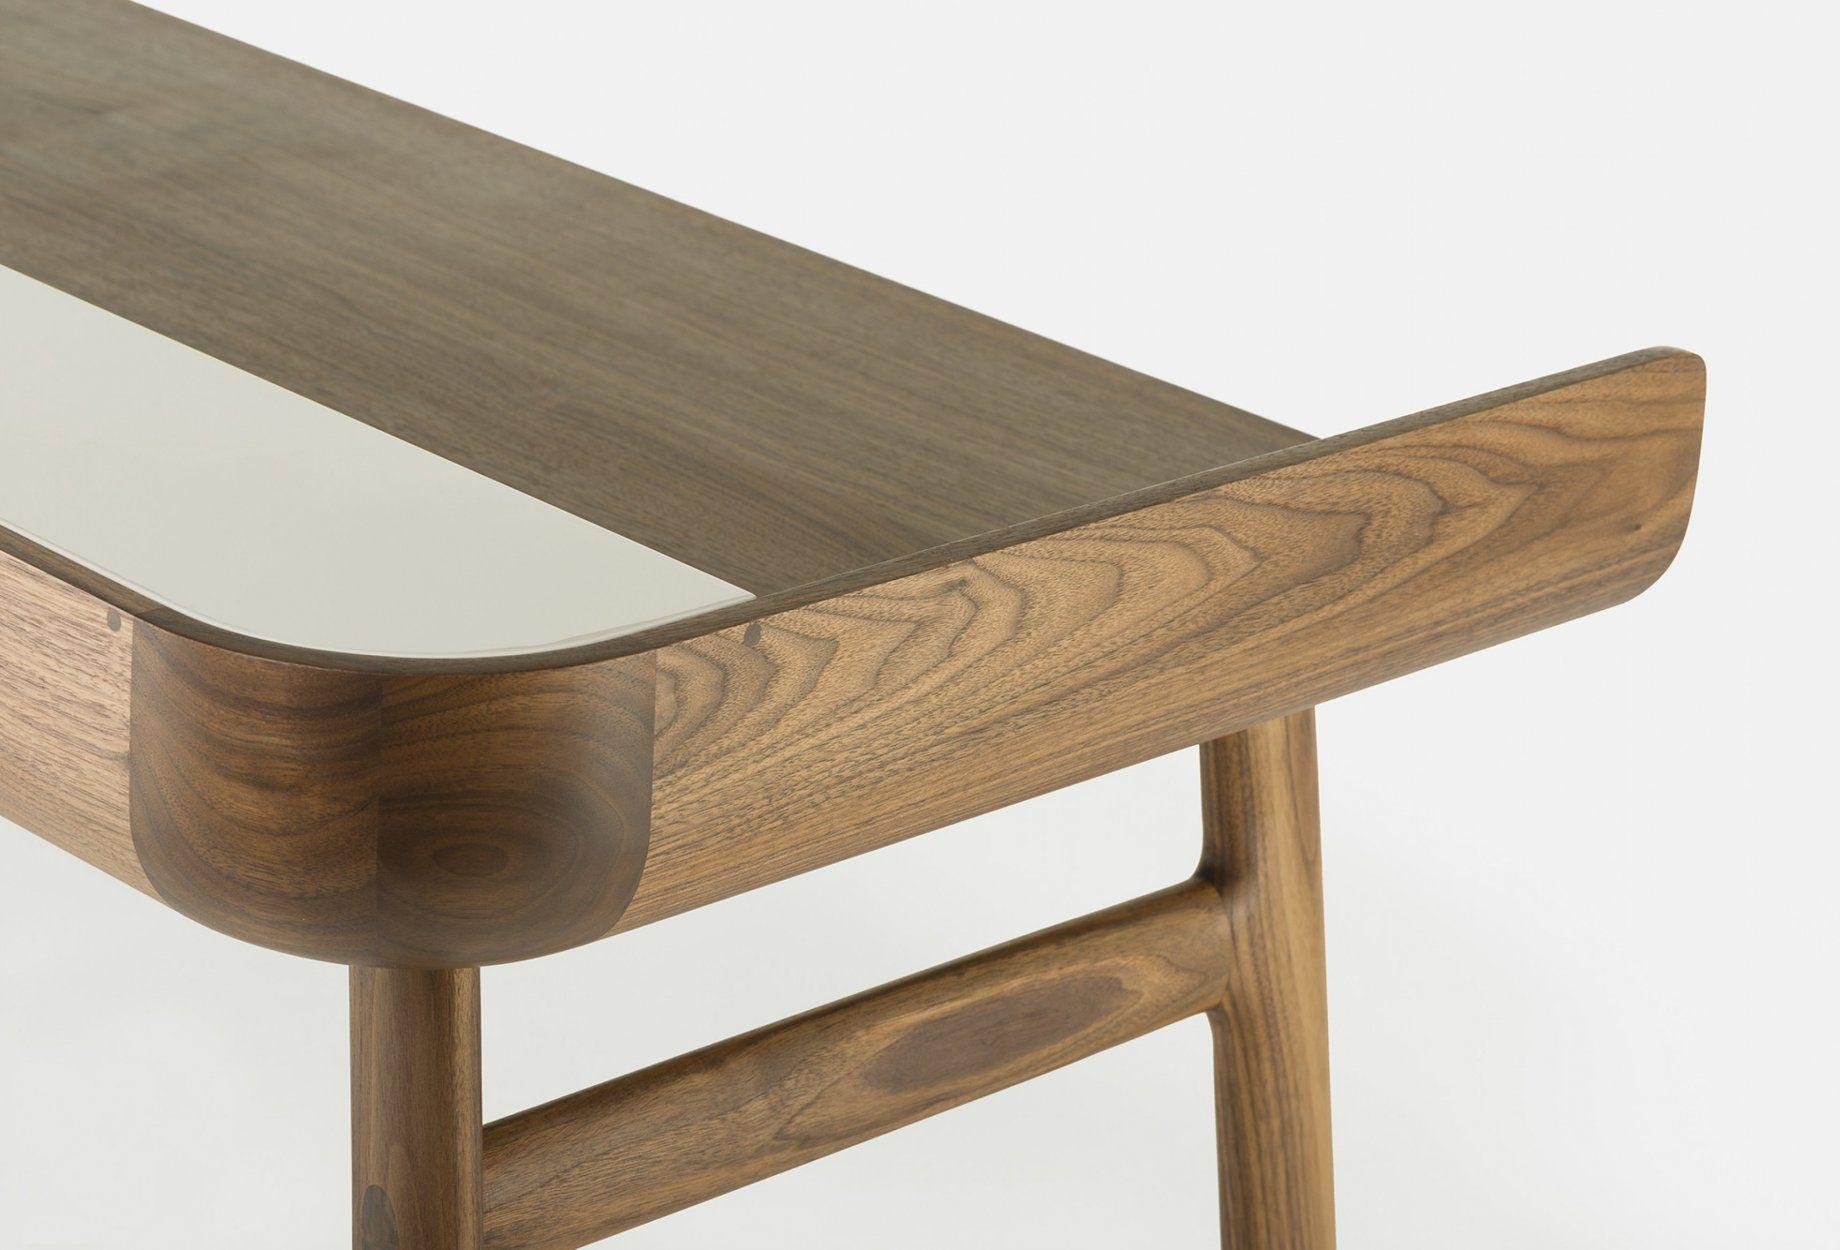 Detail of harold desk by nichetto surface in bureau